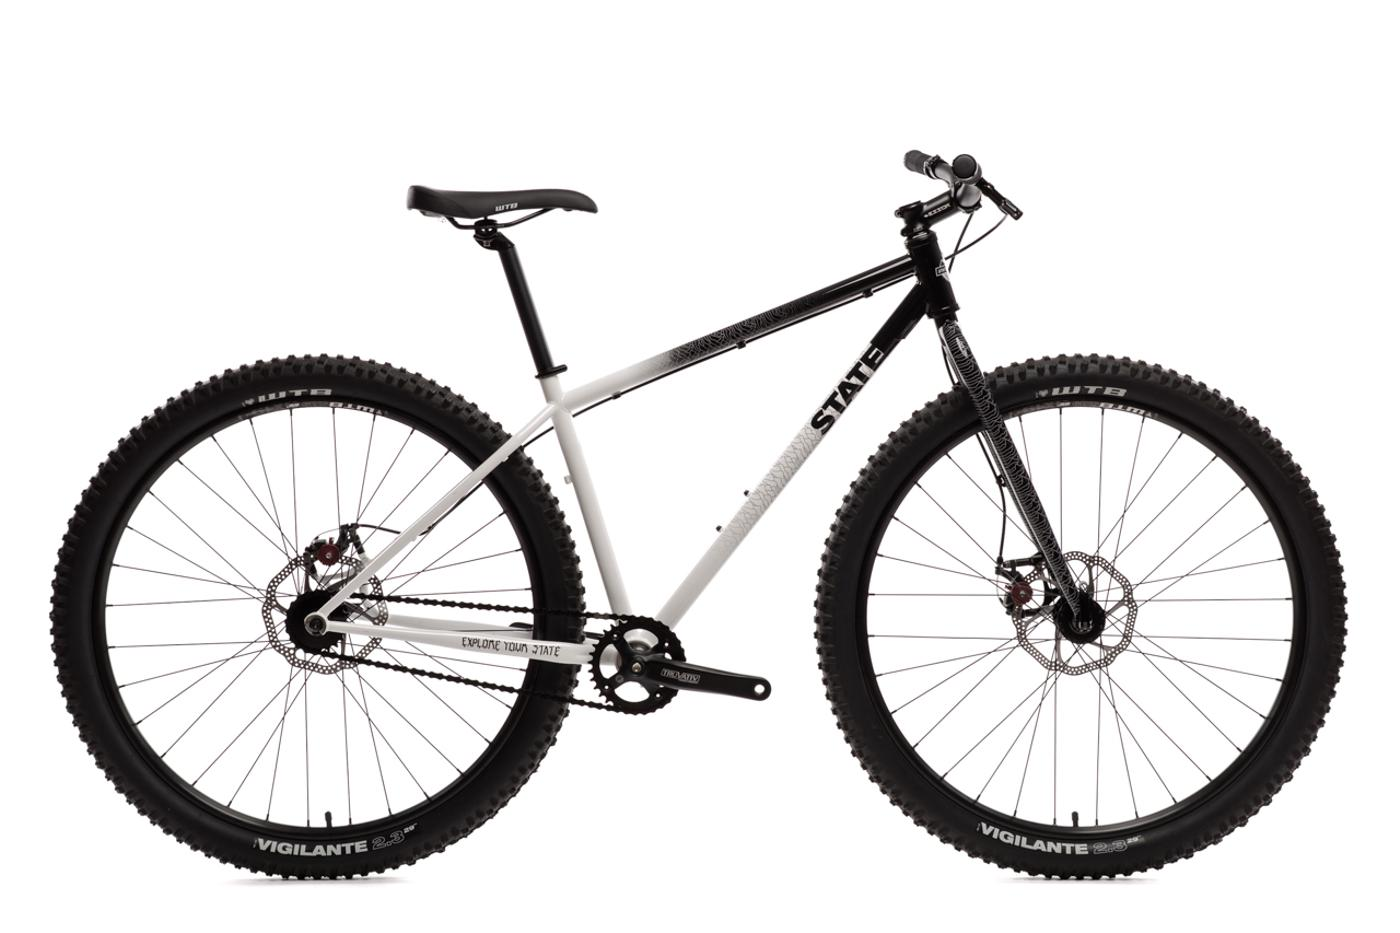 State_Bicycle_Co_29er_Single_Speed_MTB_STD_34